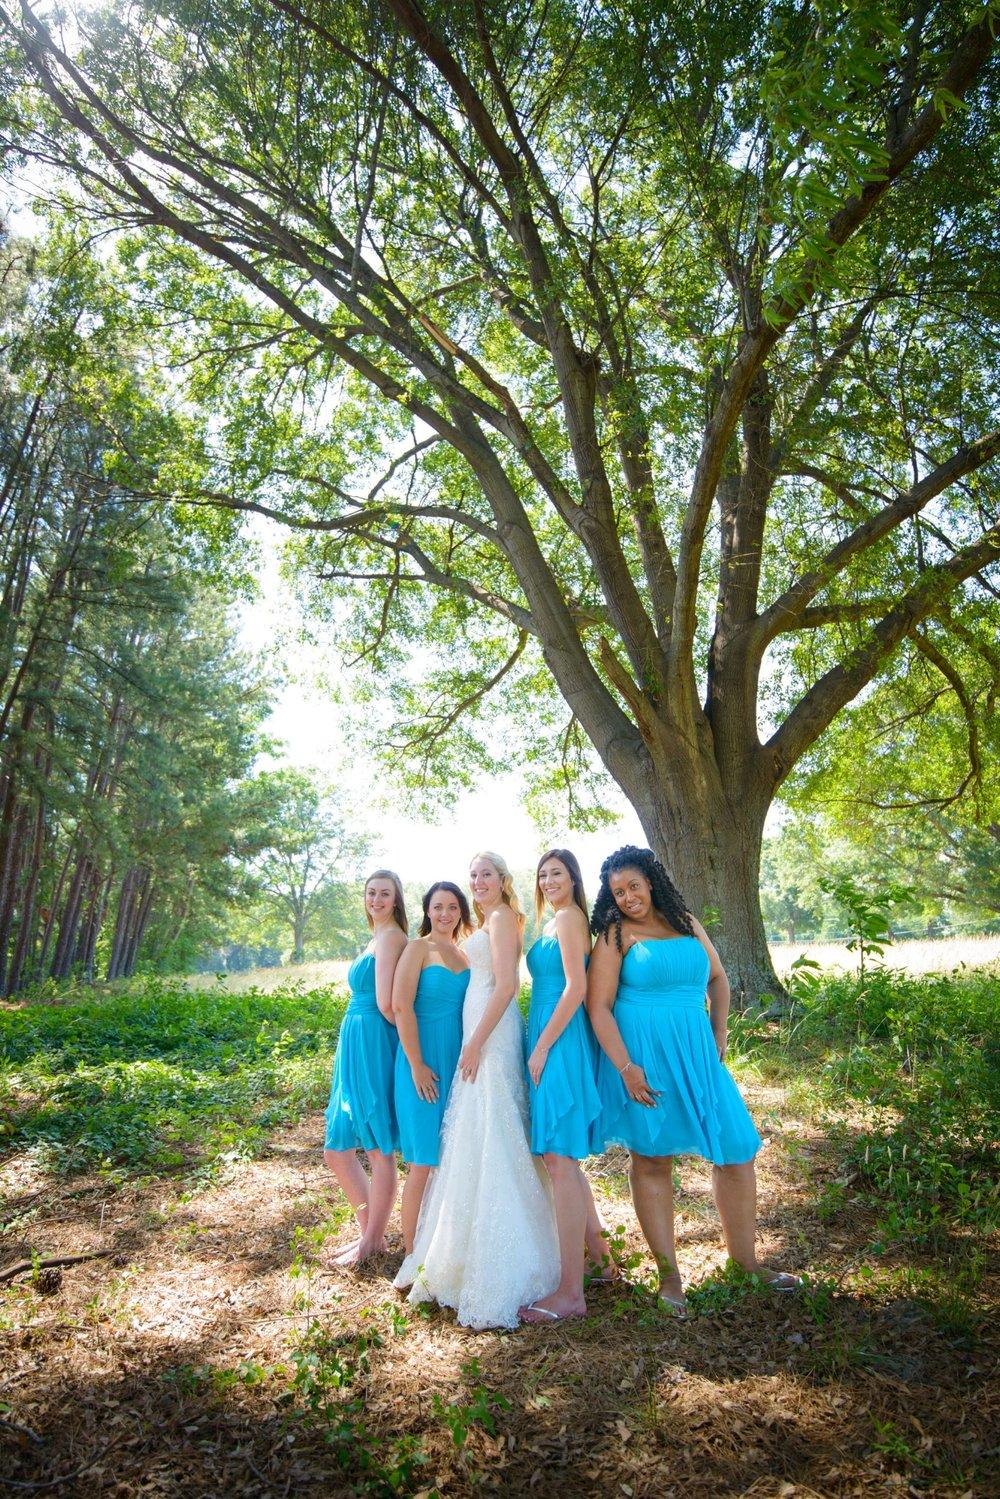 ks-twigs-tempietto-wedding-1.jpg